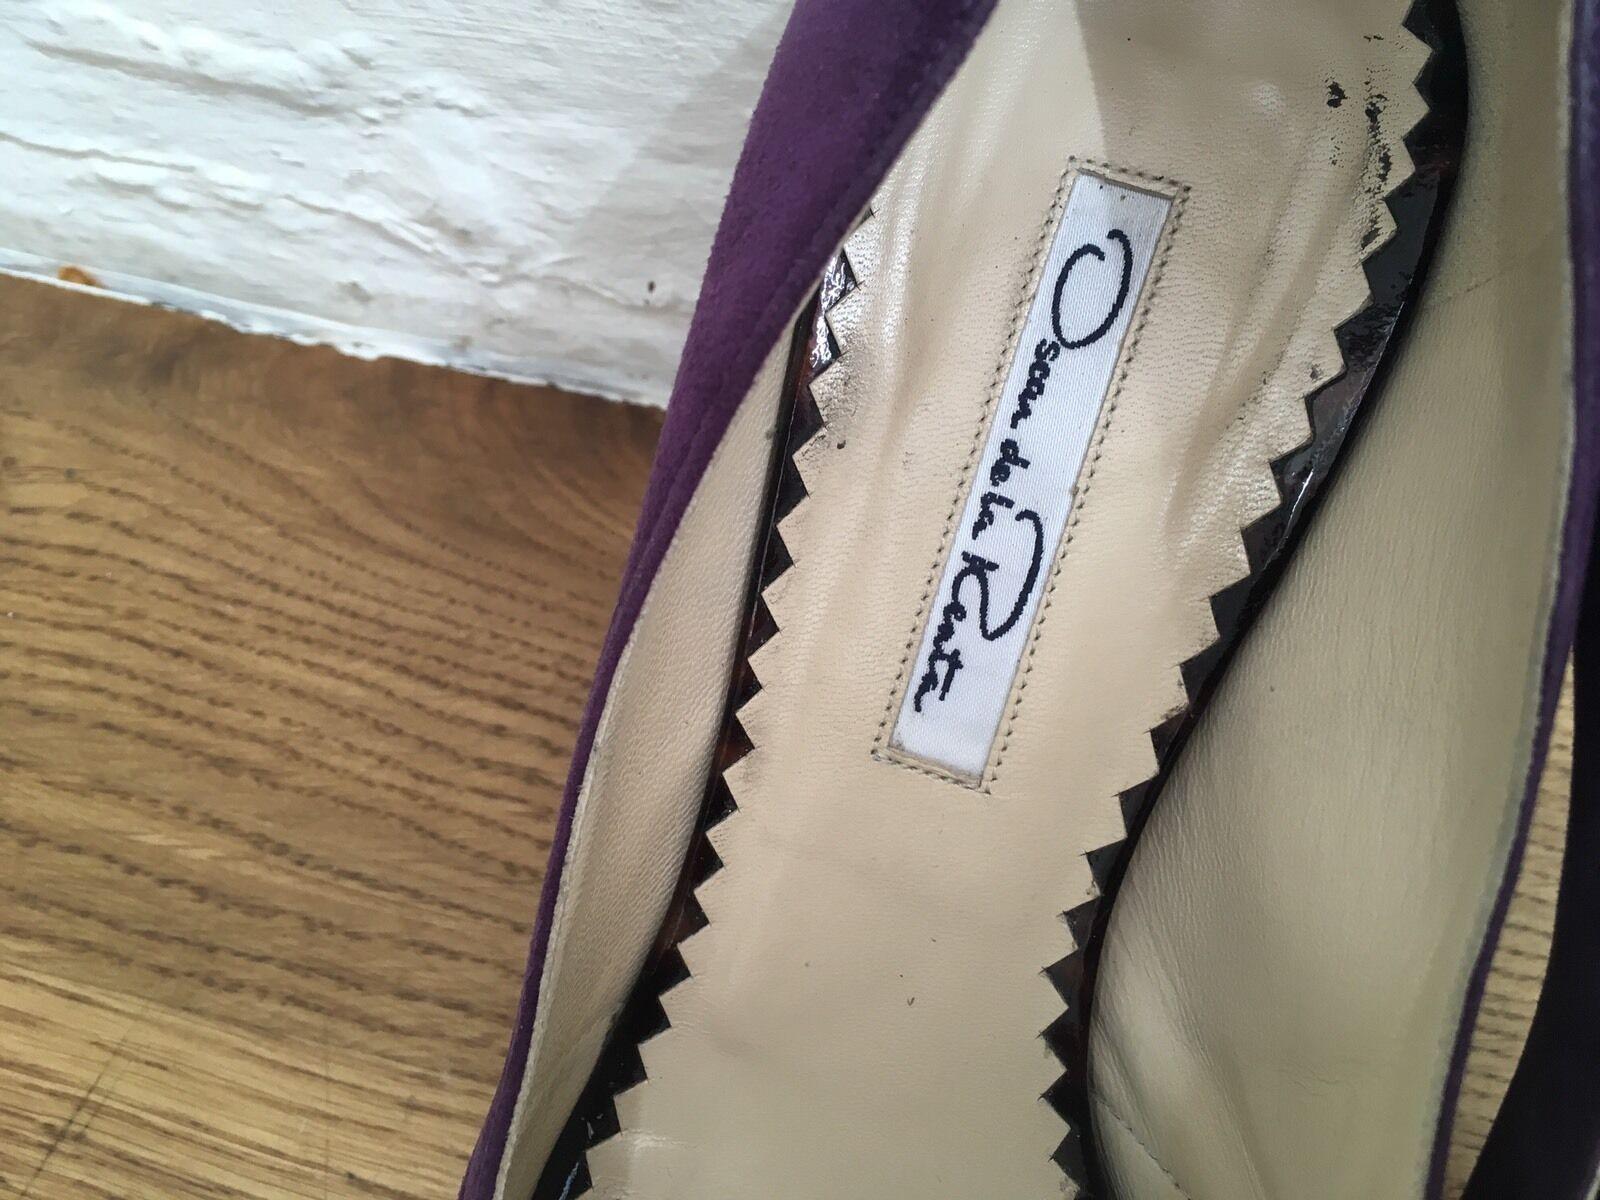 Oscar de de de la Renta jewel suede peep-toe platform Schuhes Pumps Größe 37 UK 4 US 7 156d0c